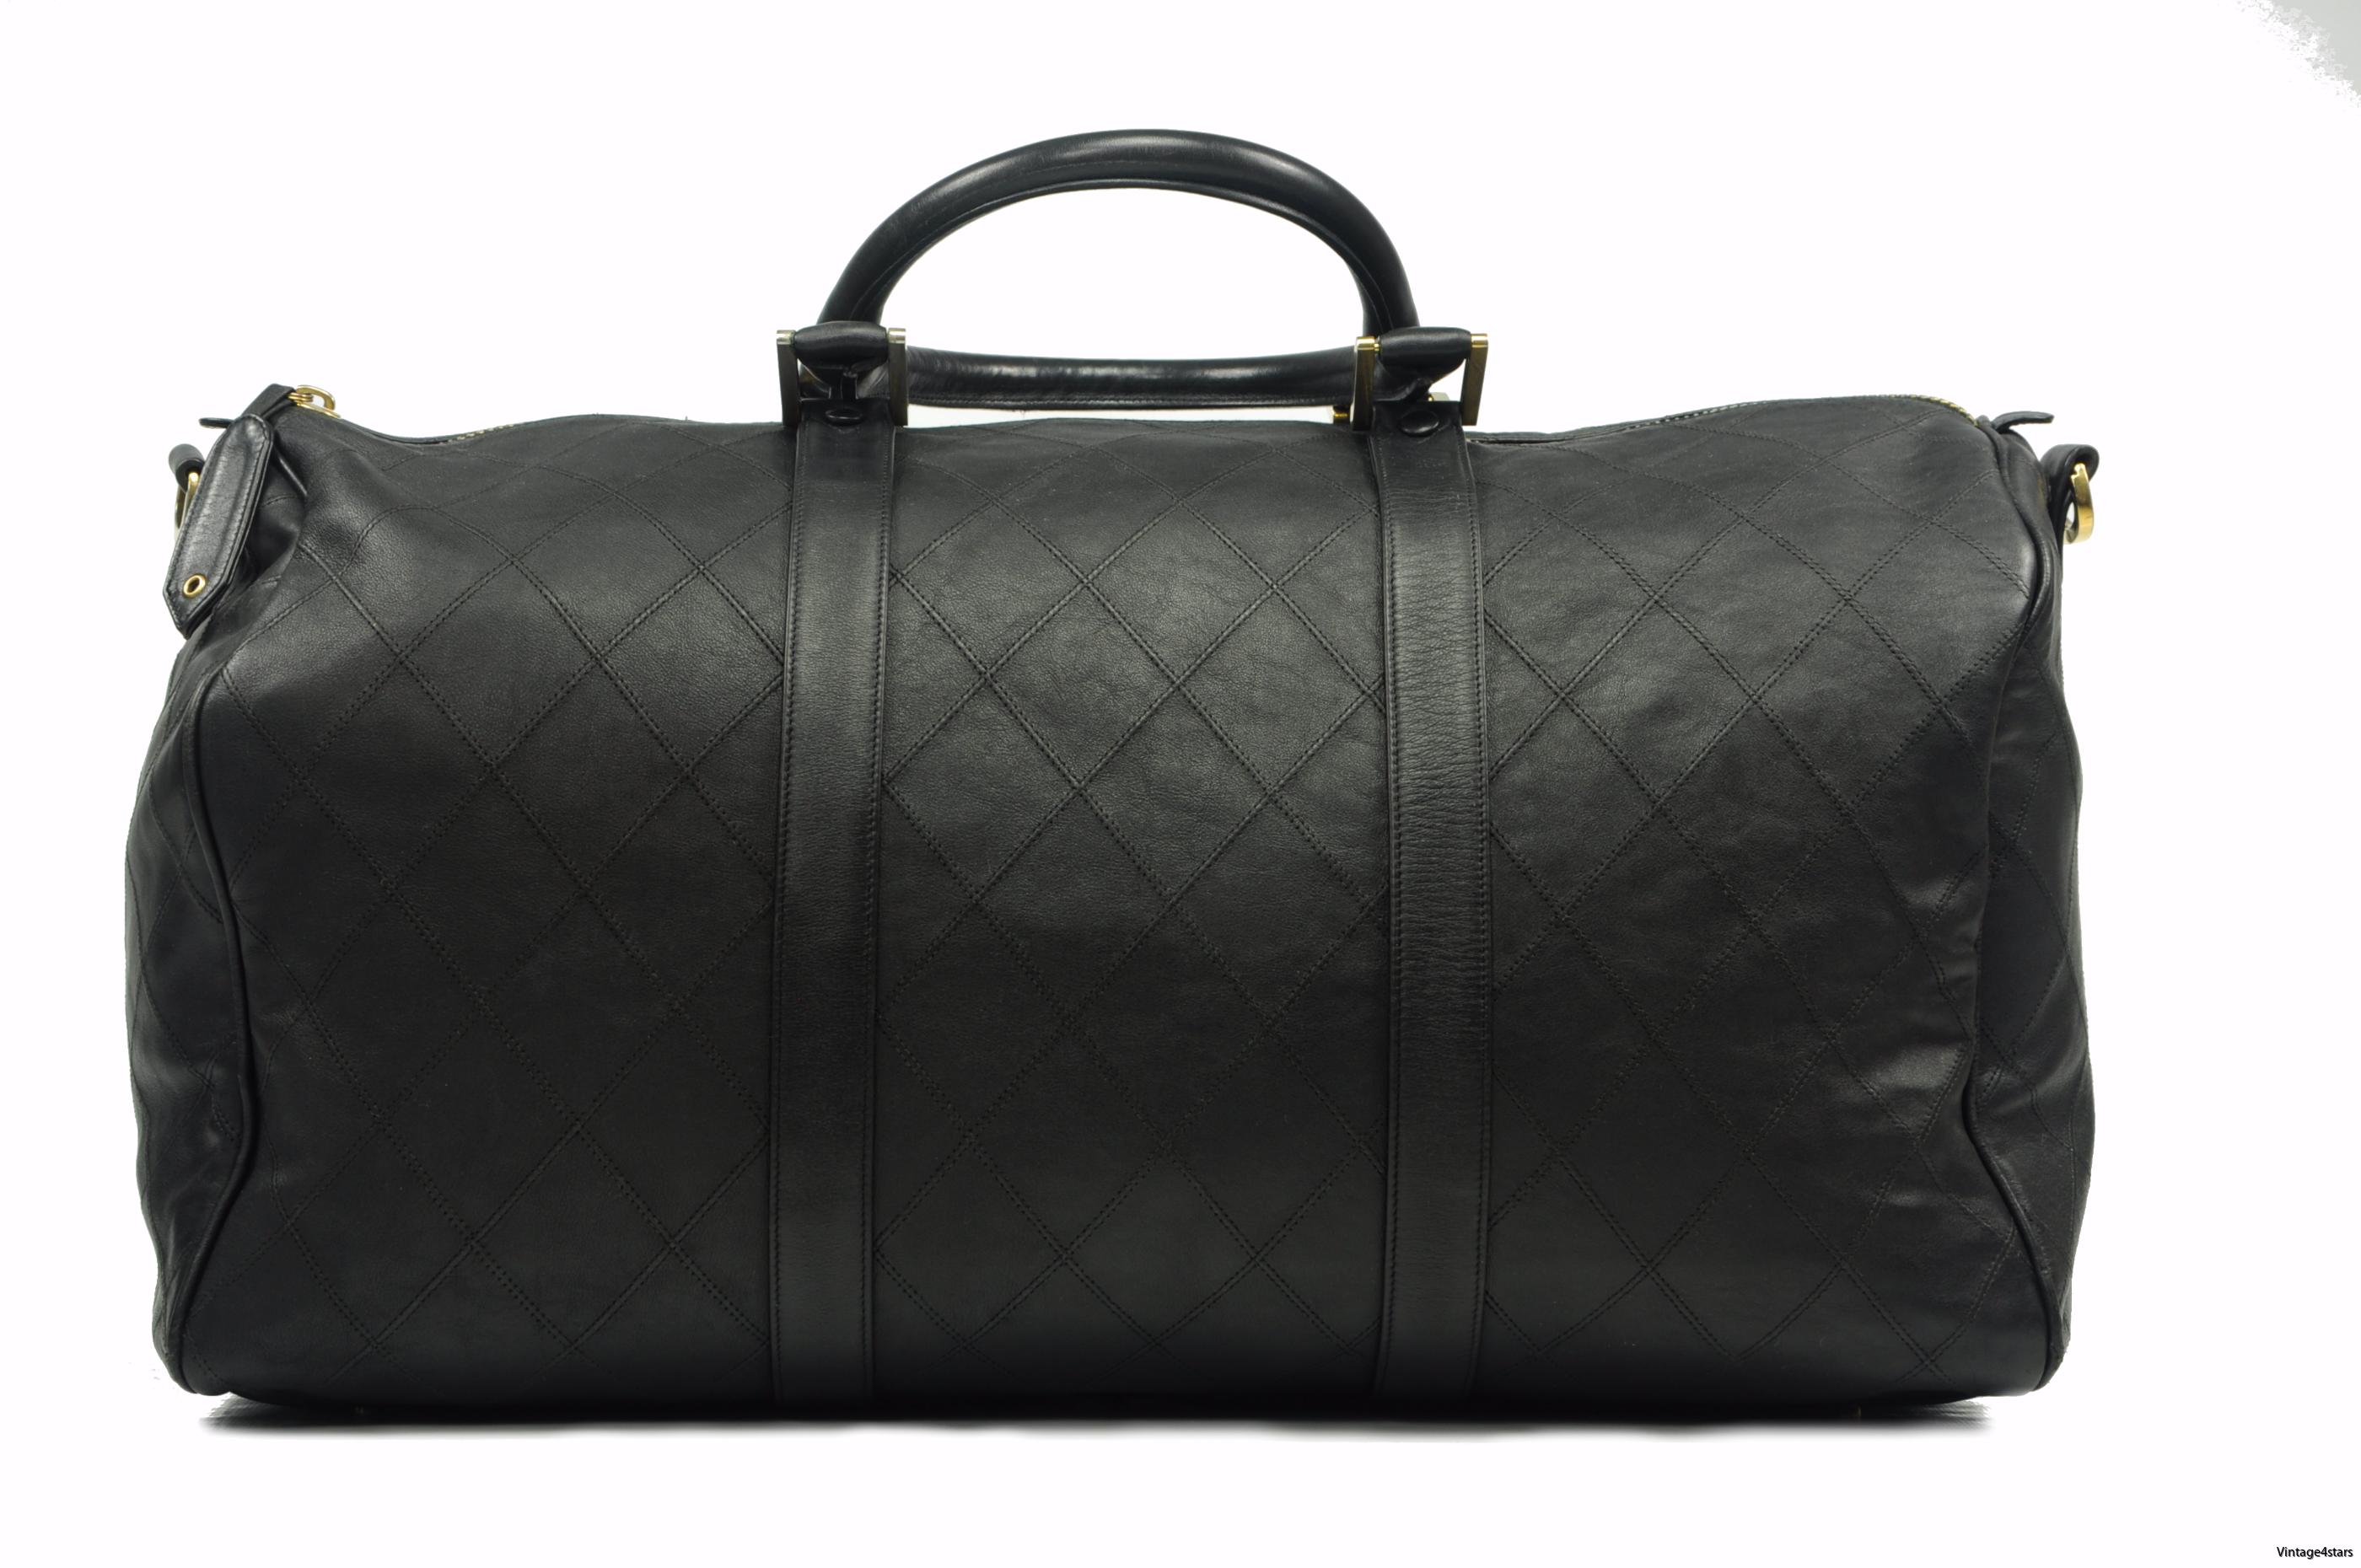 CHANEL Duffle Bag Calfskin 1